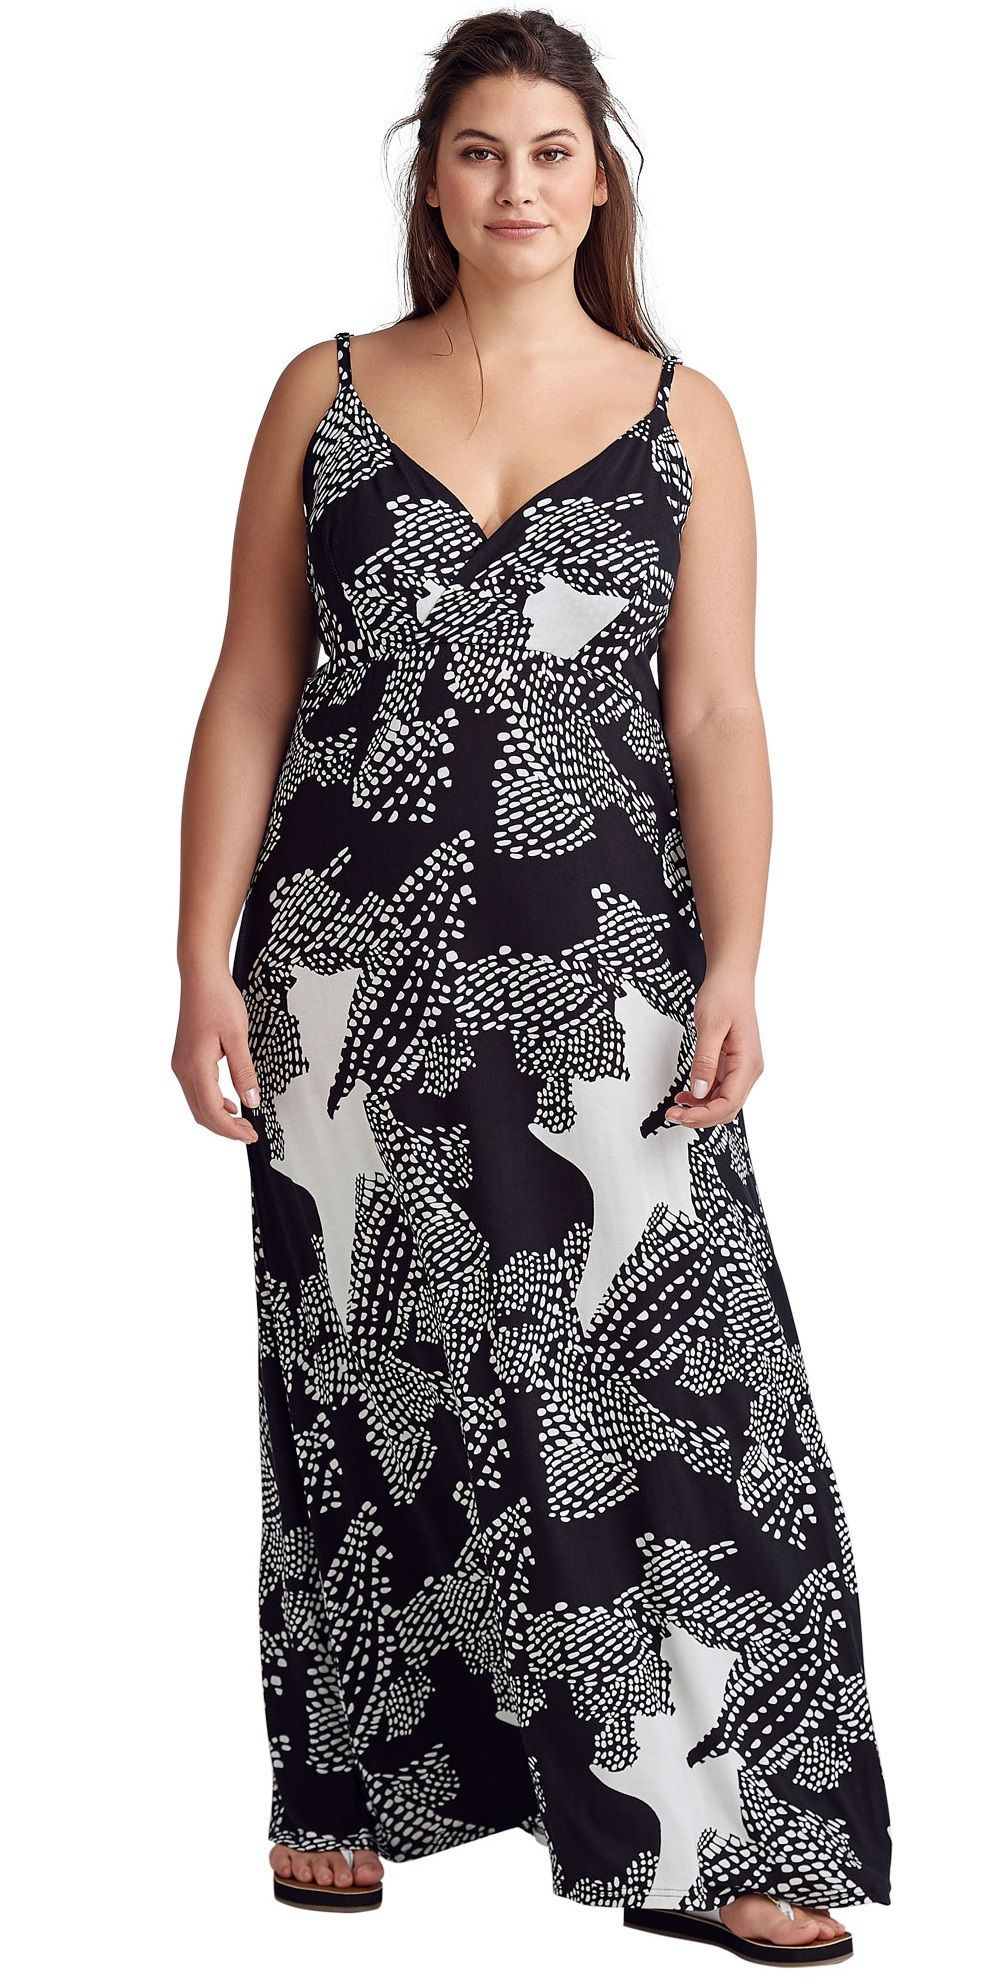 Plus Size Knit Surplice Maxi Dress Sponsored Walmartfashion Wedressamerica Plussize Plus Size Outfits Maxi Dress Plus Size Maxi Dresses [ 1981 x 1005 Pixel ]